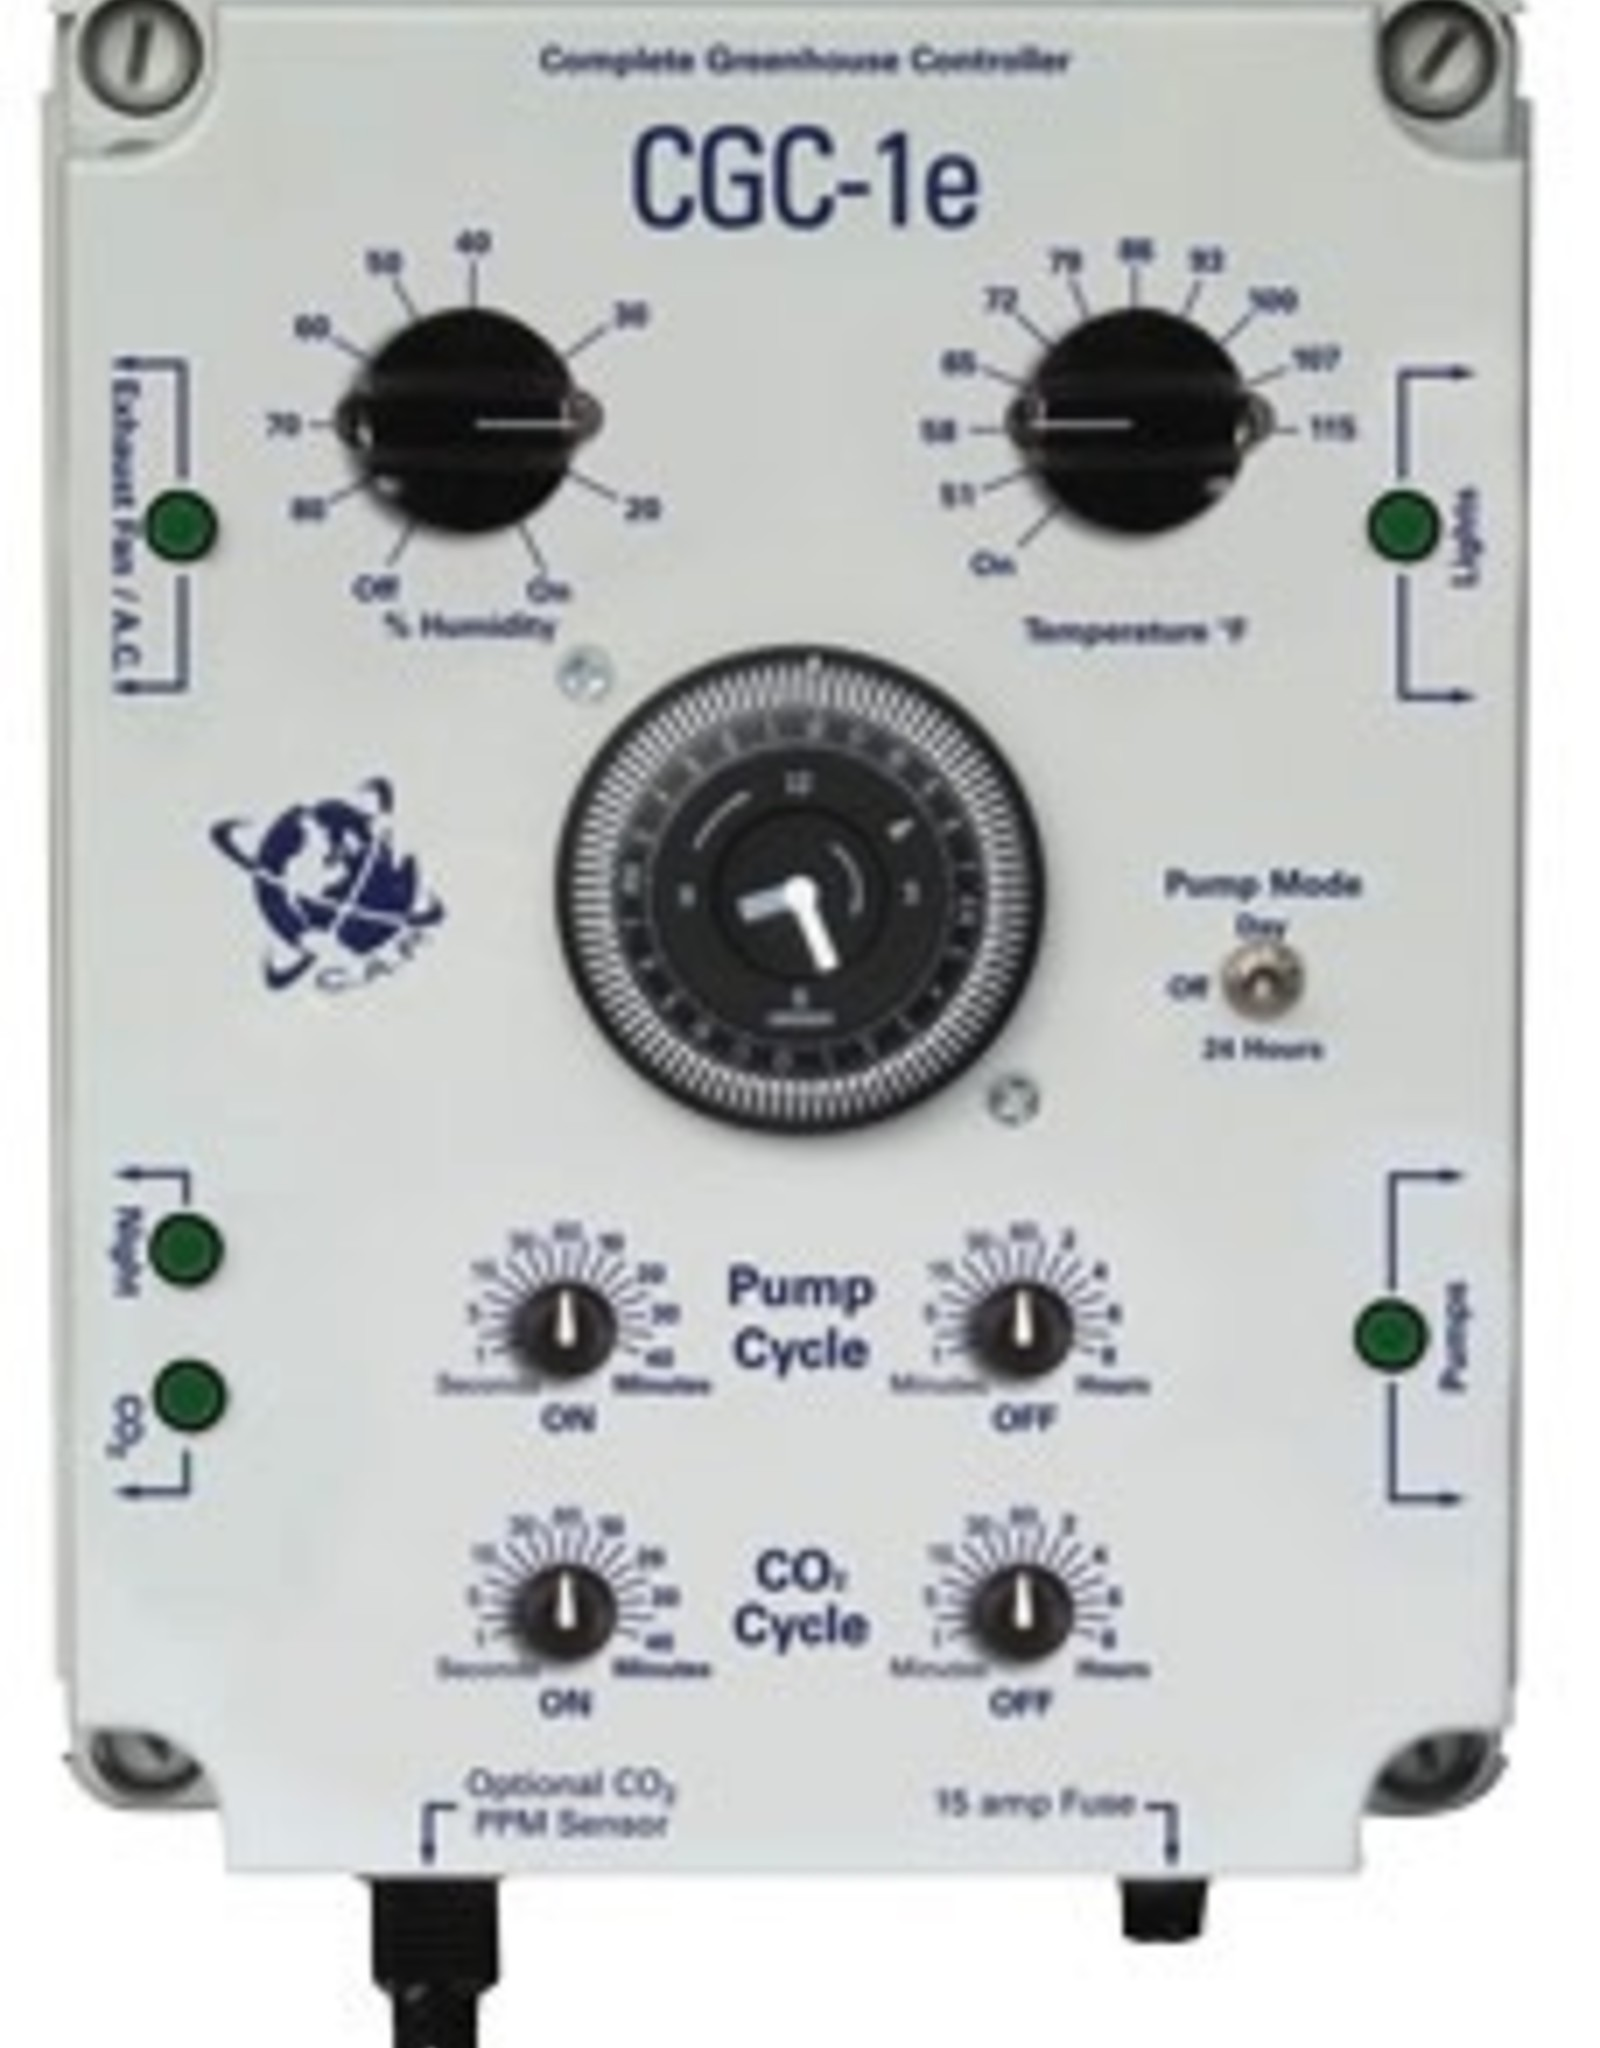 CAP CGC-1e Complete Greenhouse Controller (w/ppm option)